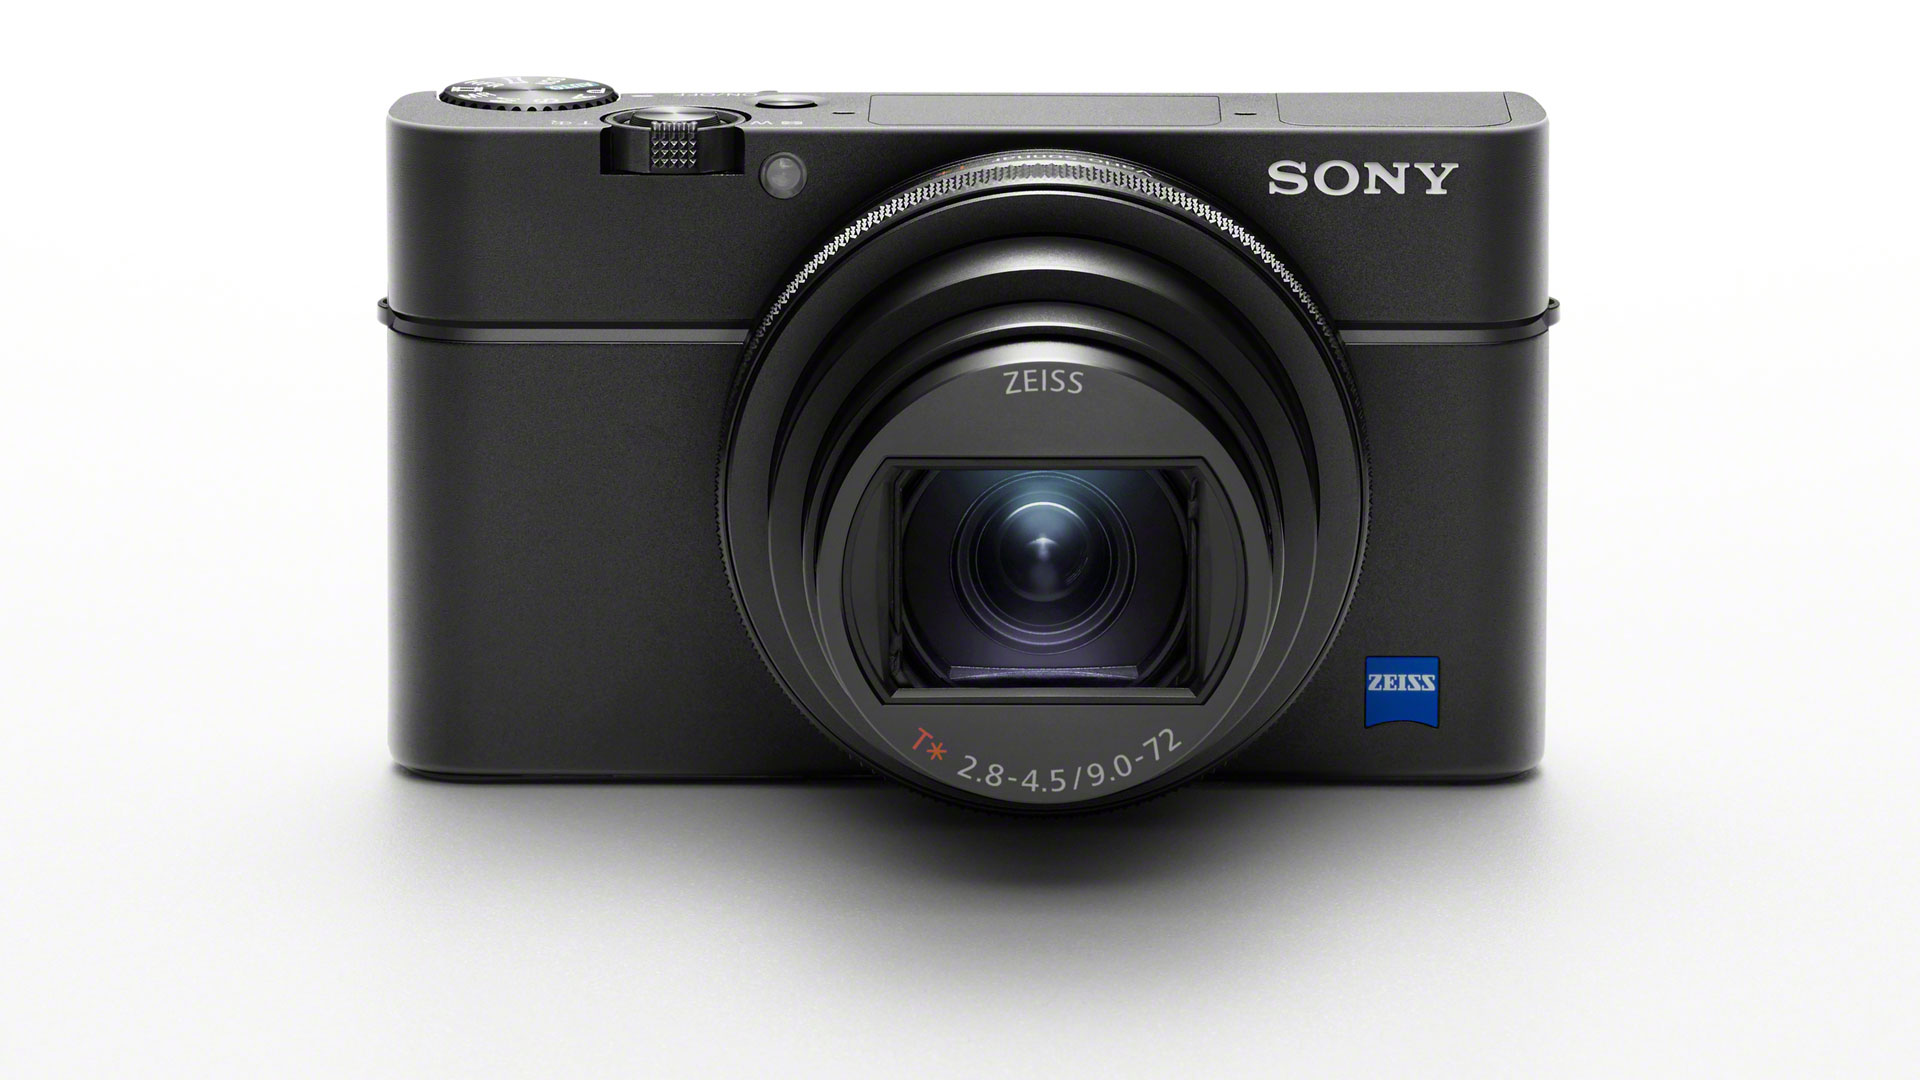 Sony RX100 VI opinion